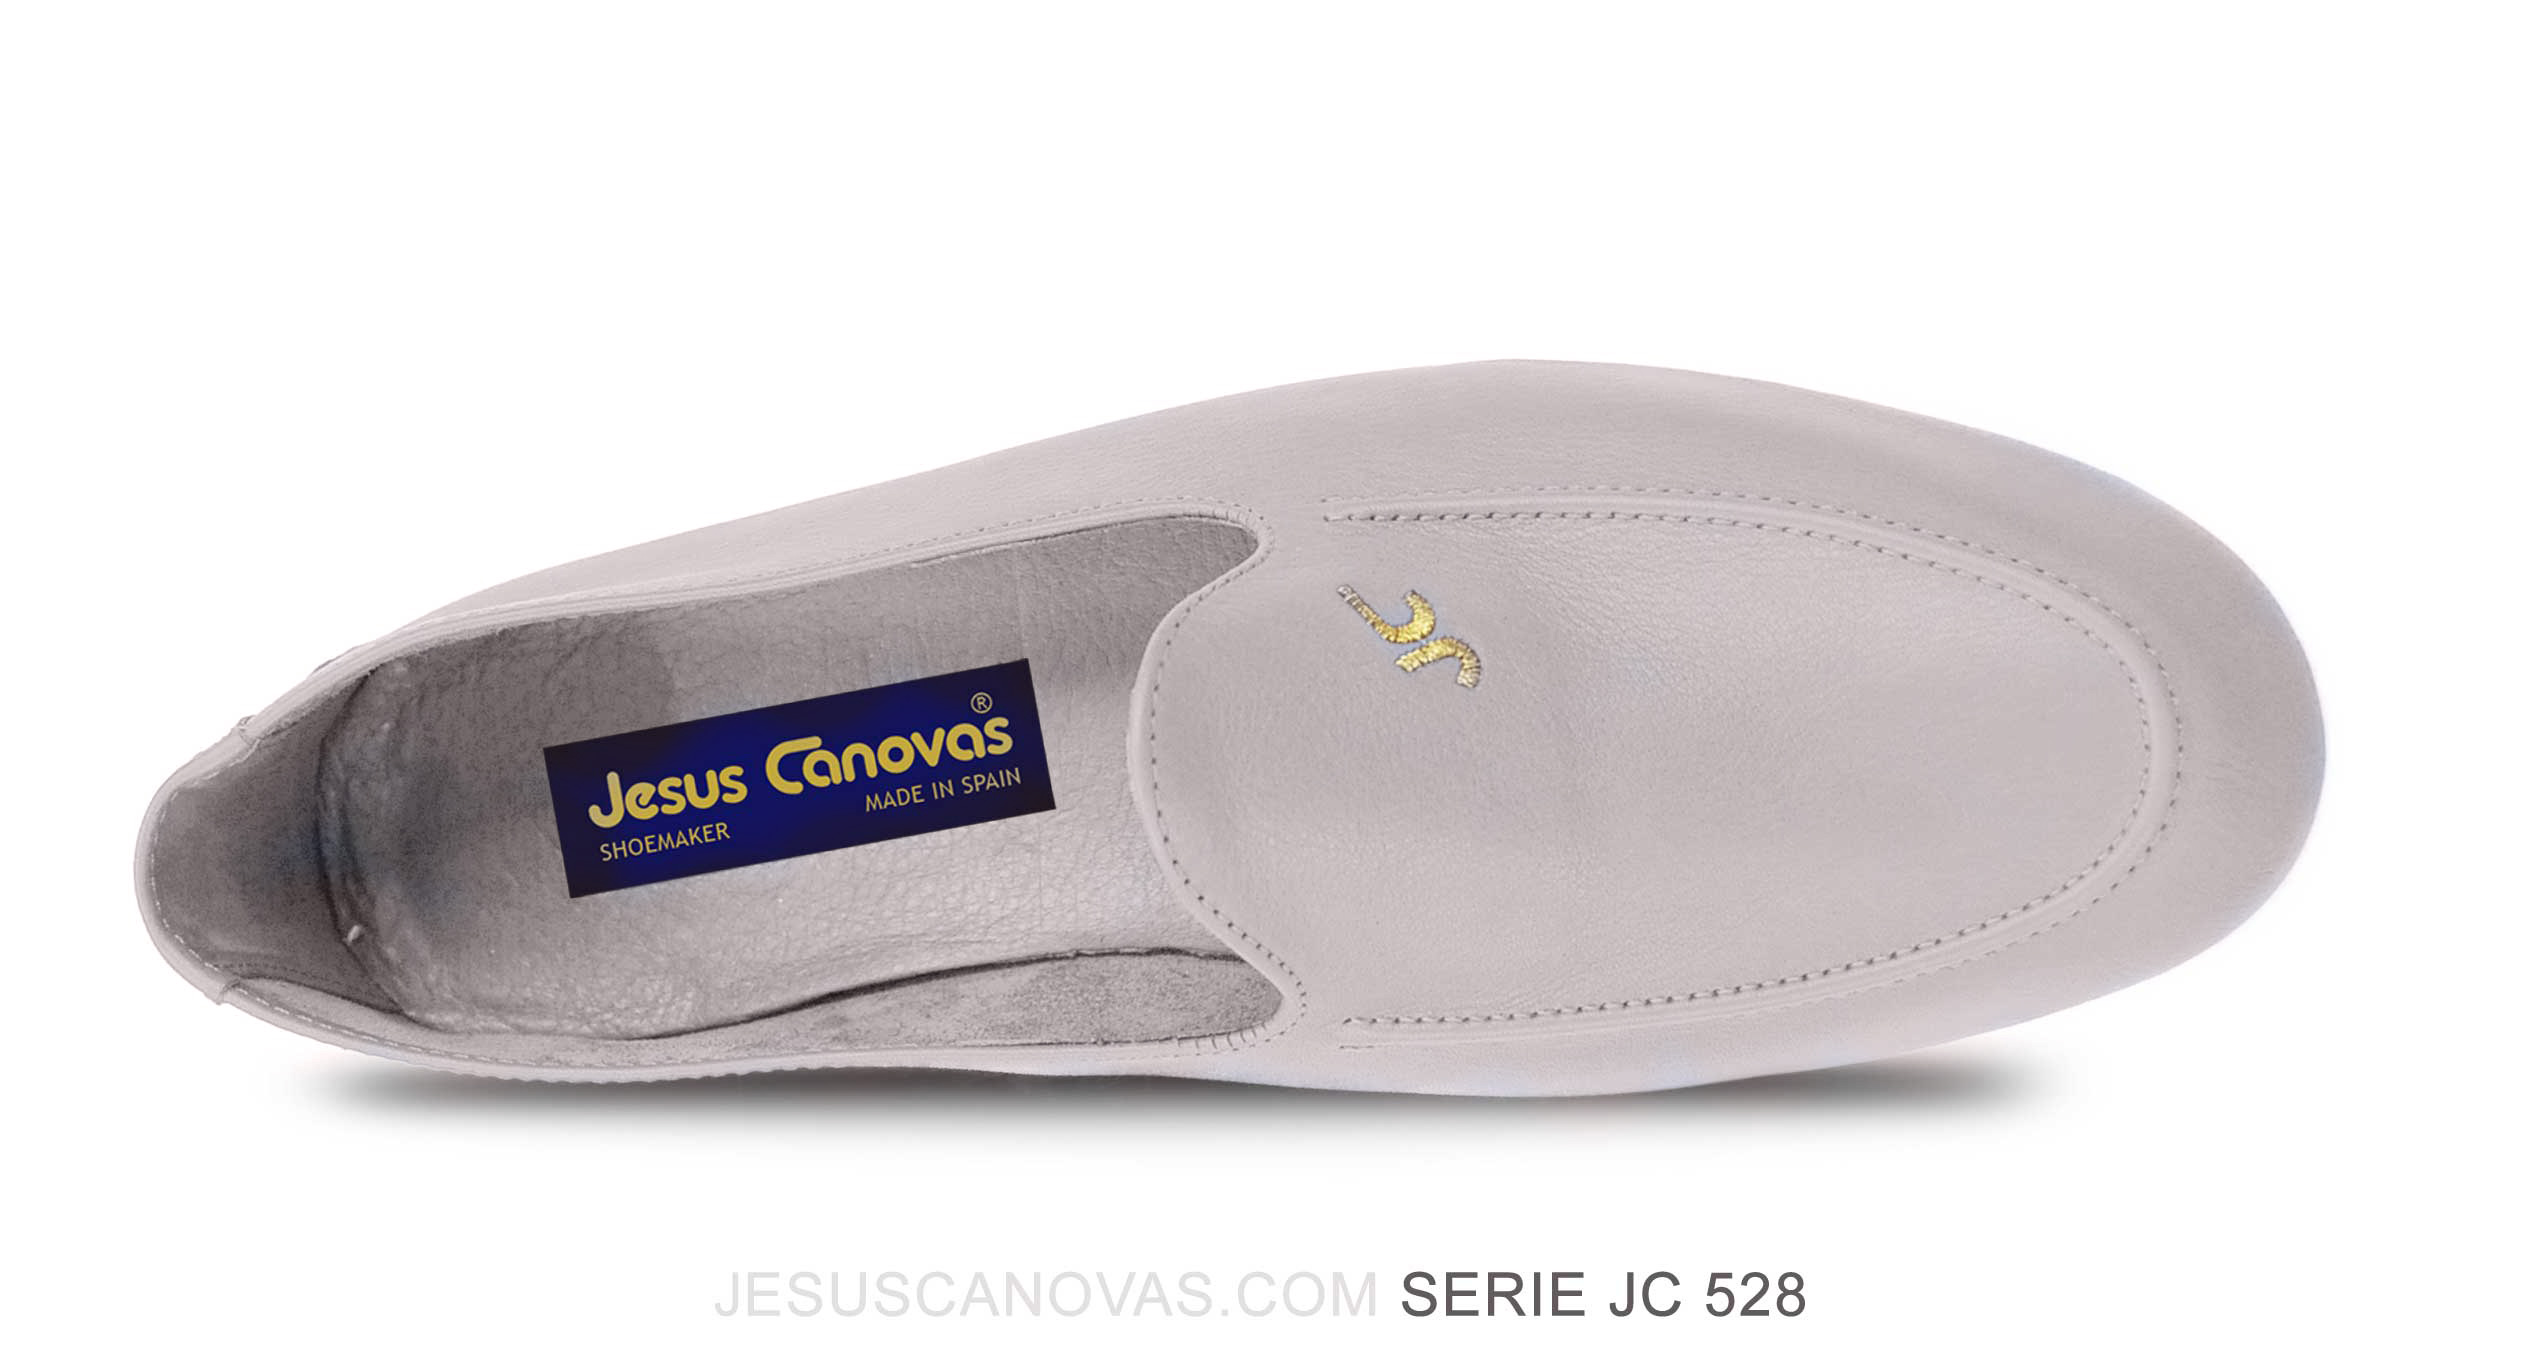 Foto 2 de Zapatos Julio Iglesias 528 JC Perla Napa Mocasin